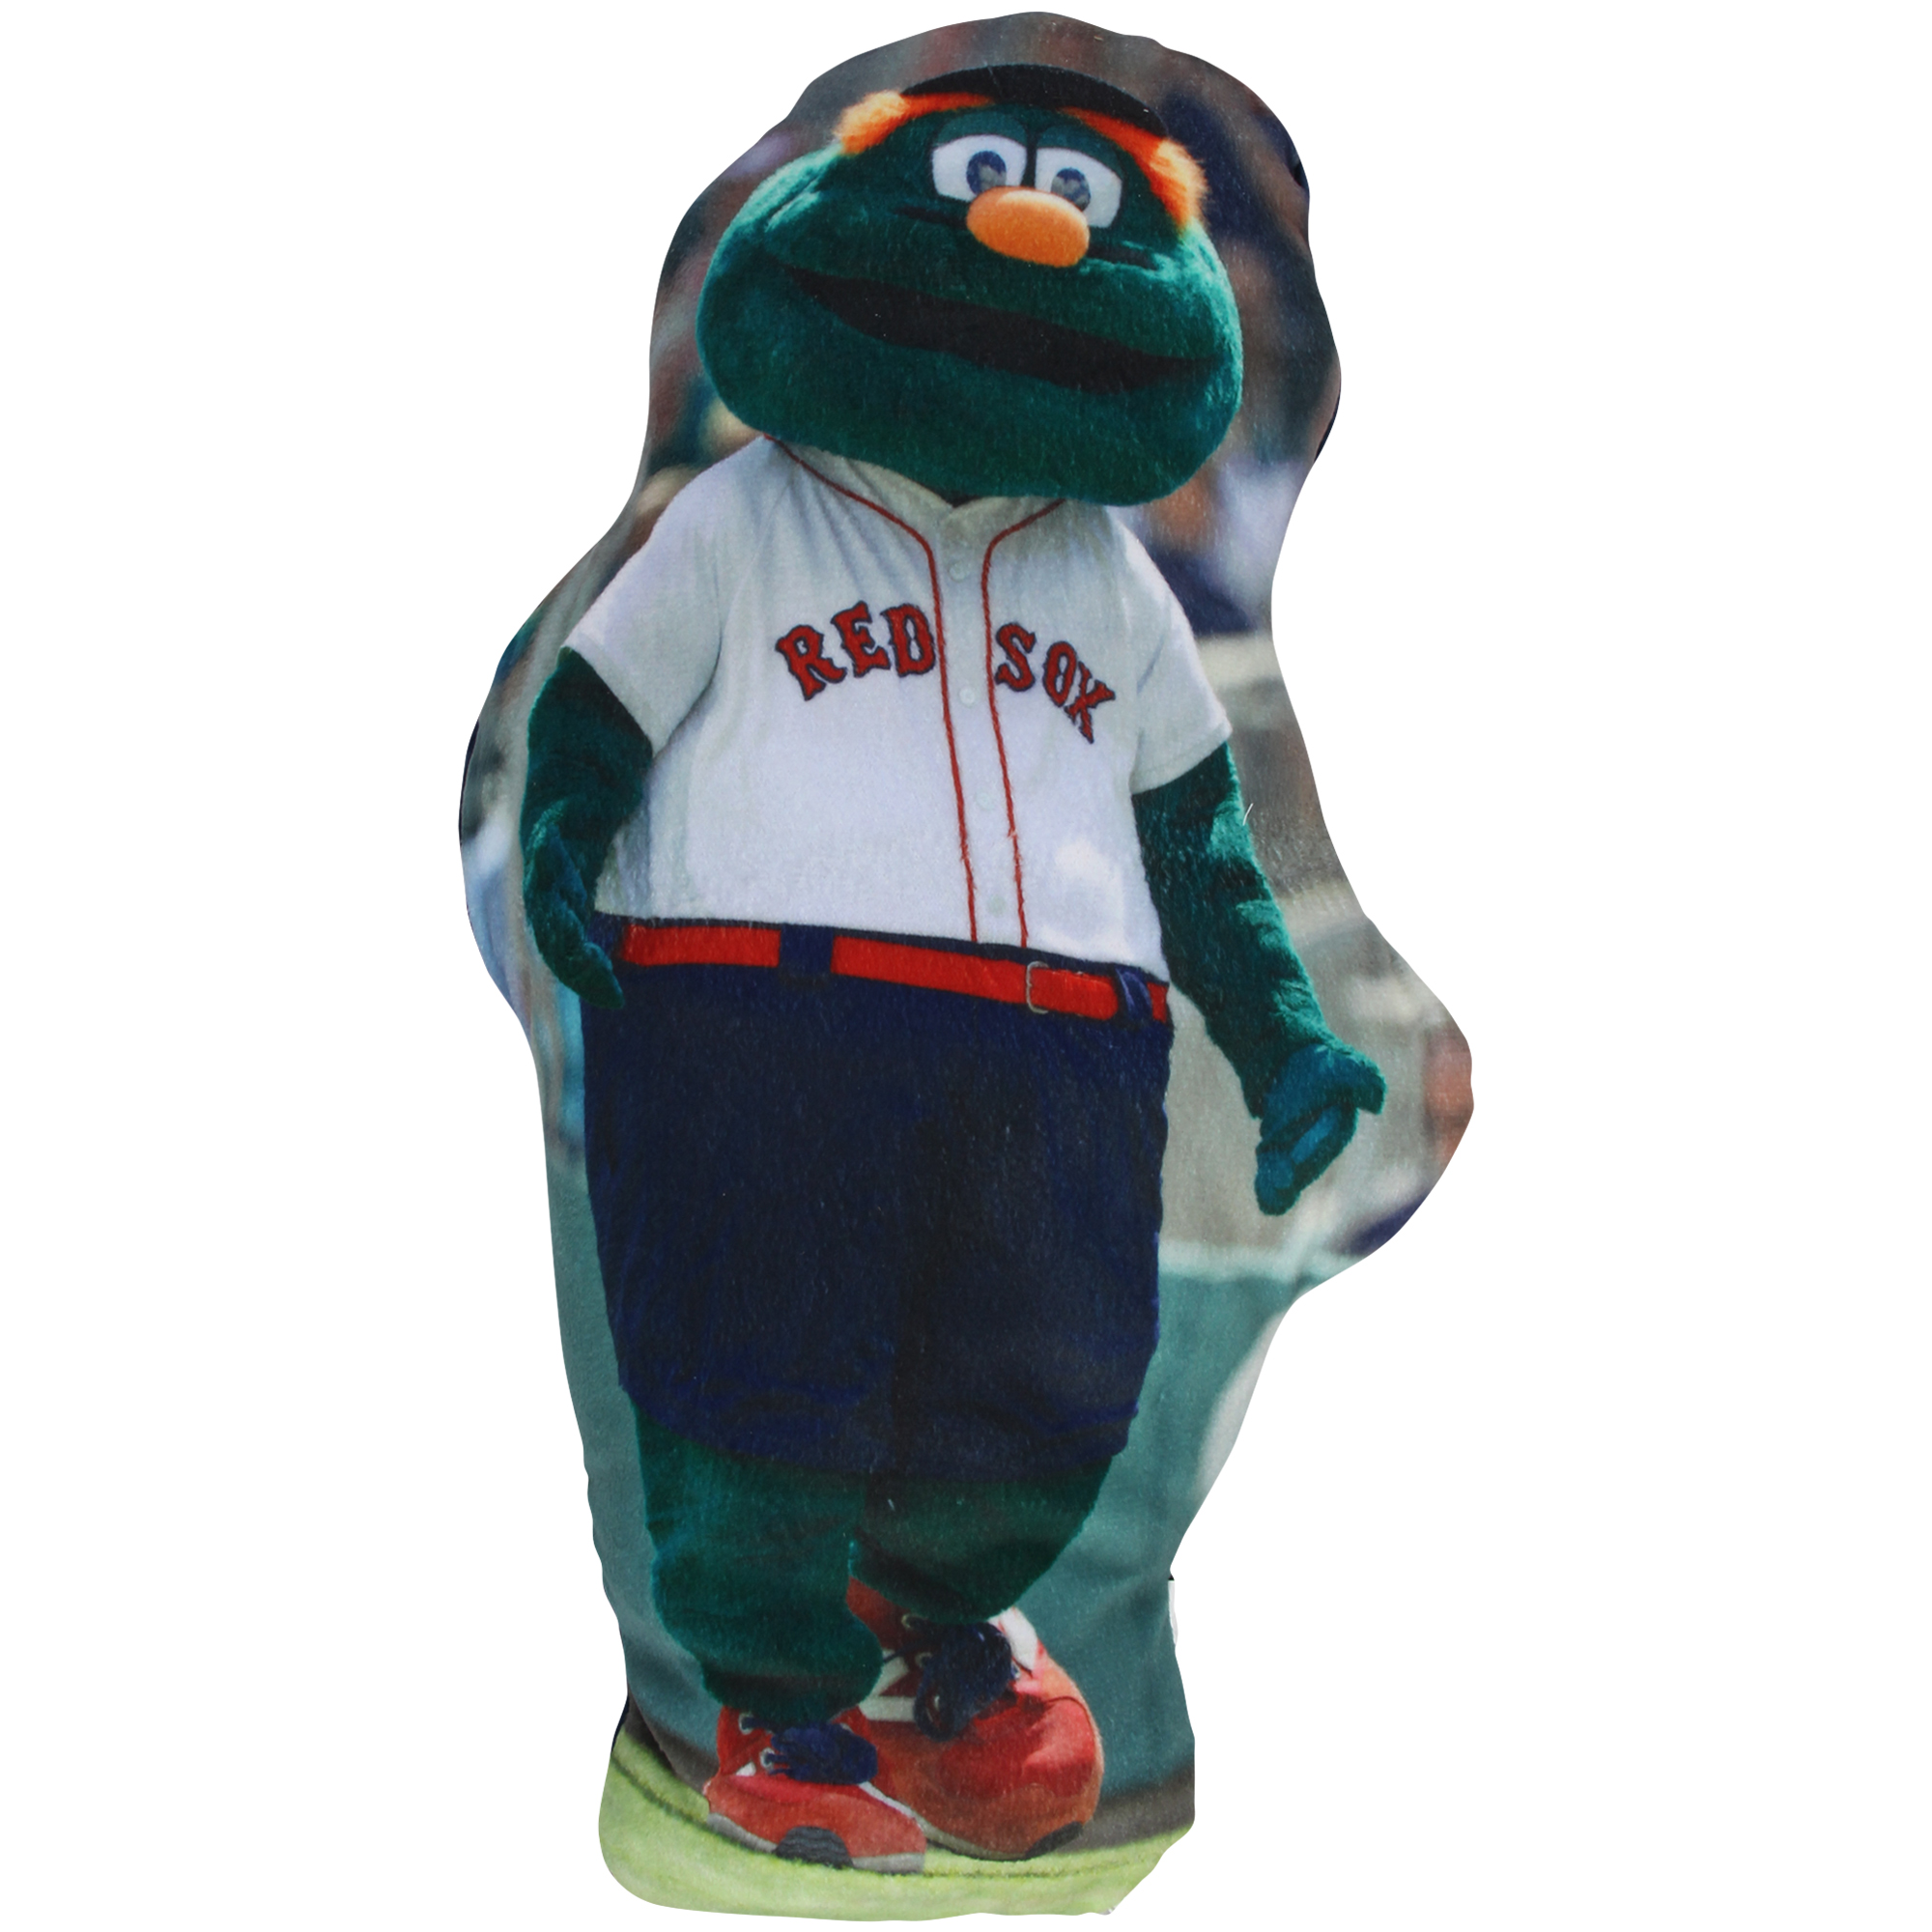 Boston Red Sox Mascot Printed Pillow - No Size